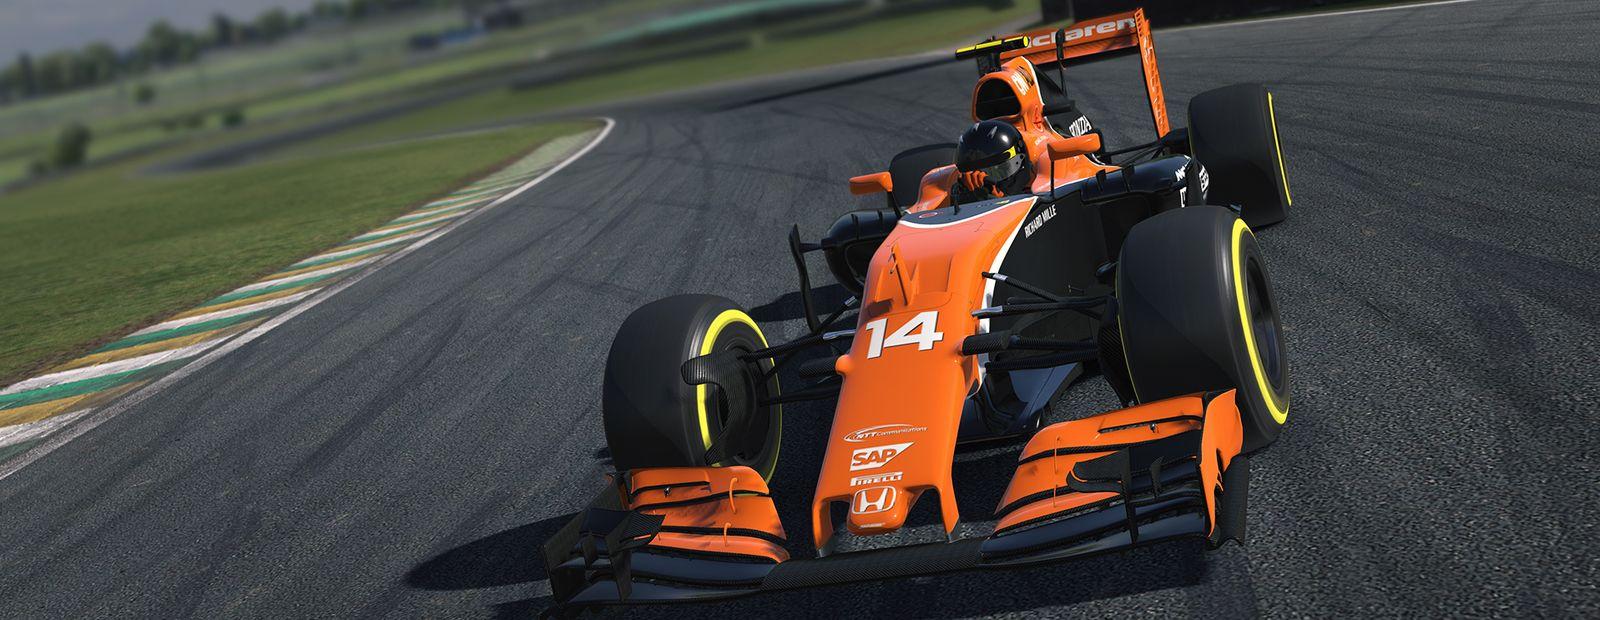 McLaren Racing - World's Fastest Gamer iRacing Qualification